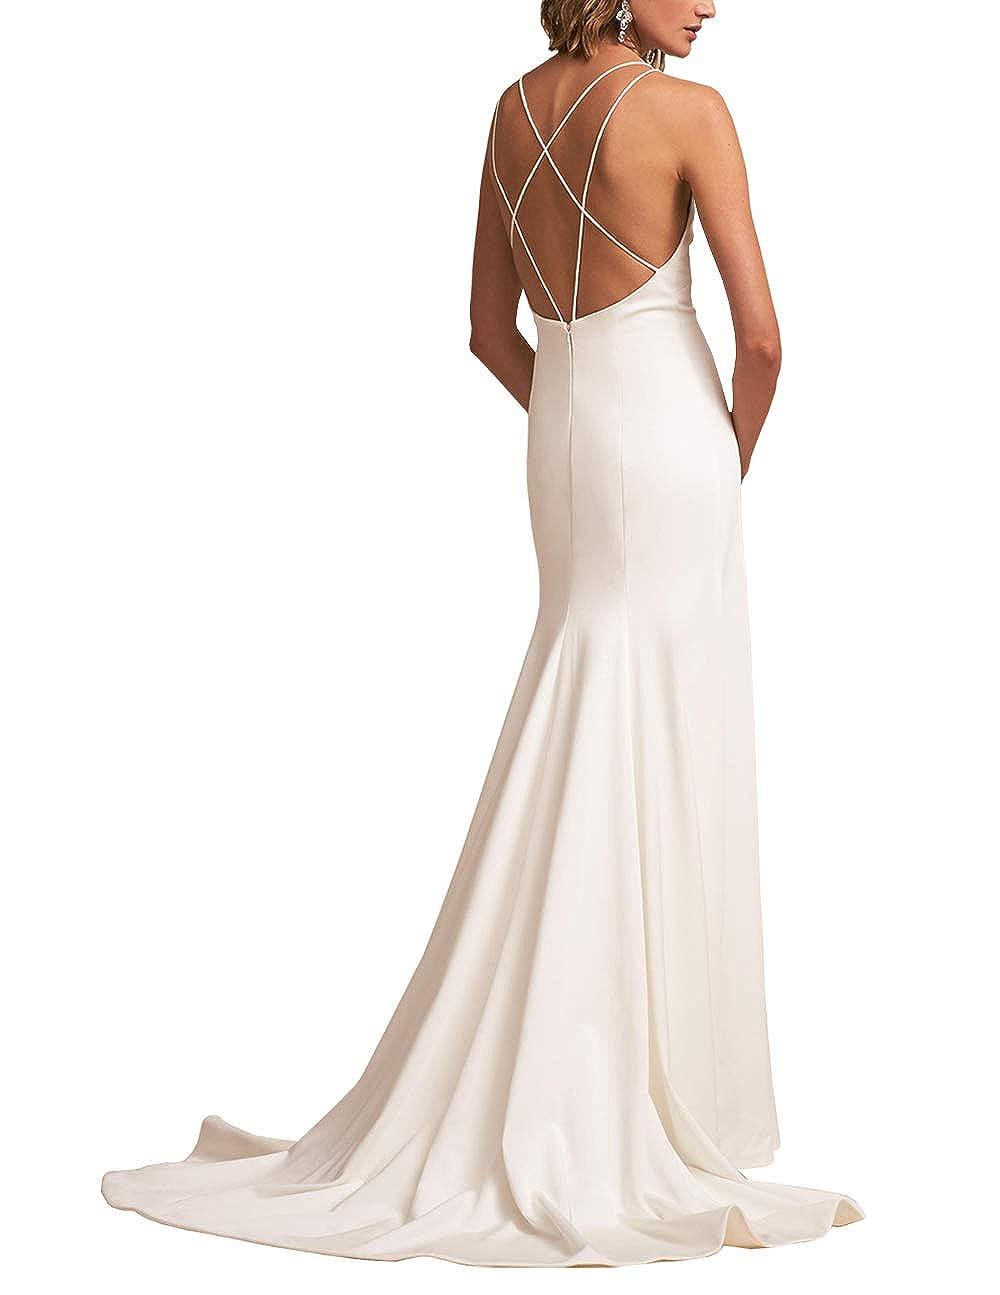 WHZZ Womens Satin Mermaid Wedding Dresses Spagetti Strap Bridal Wedding Gowns